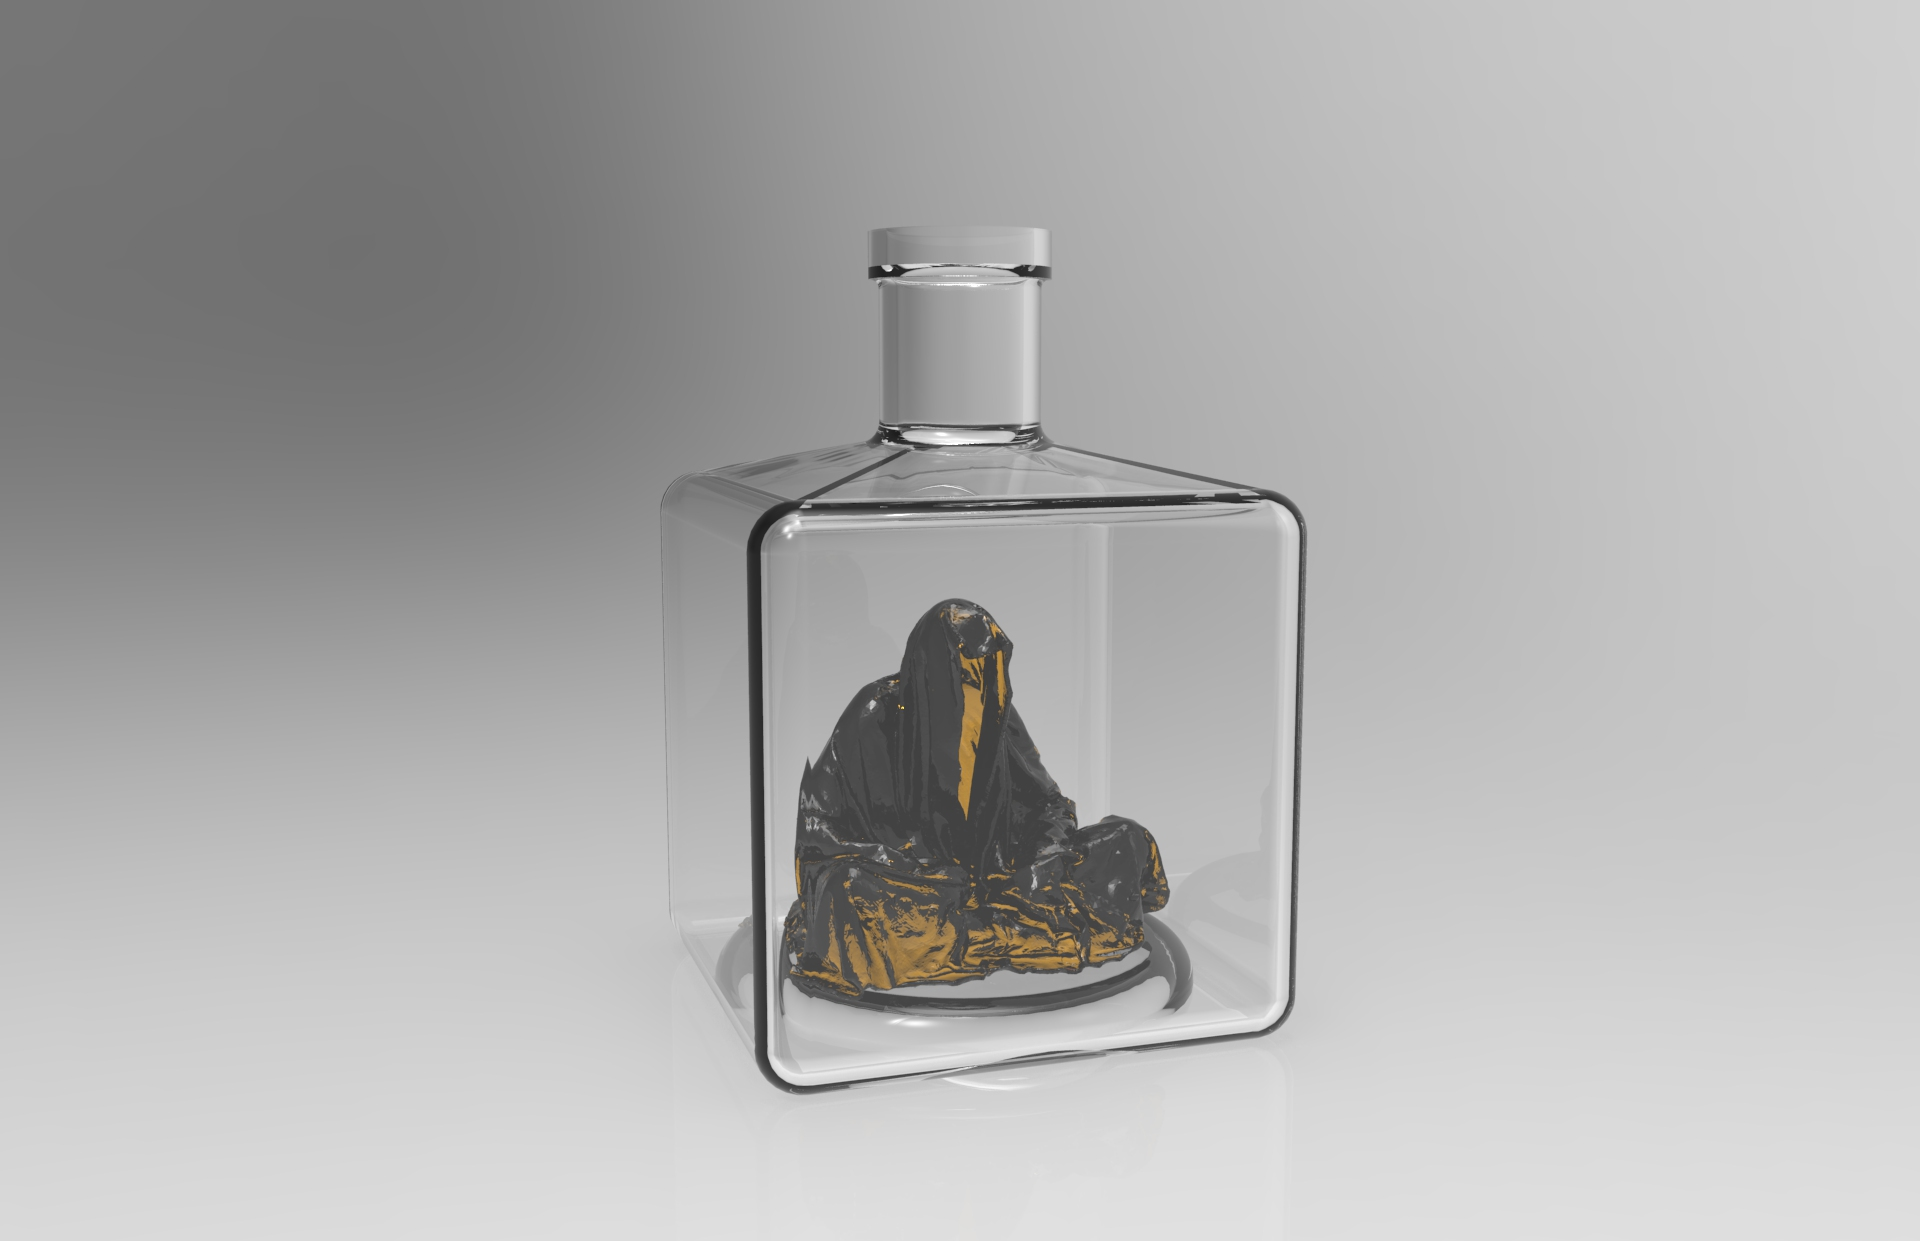 Guardian glass bottle wadka water drink manfred kili kielnhofer art arts design glass 445